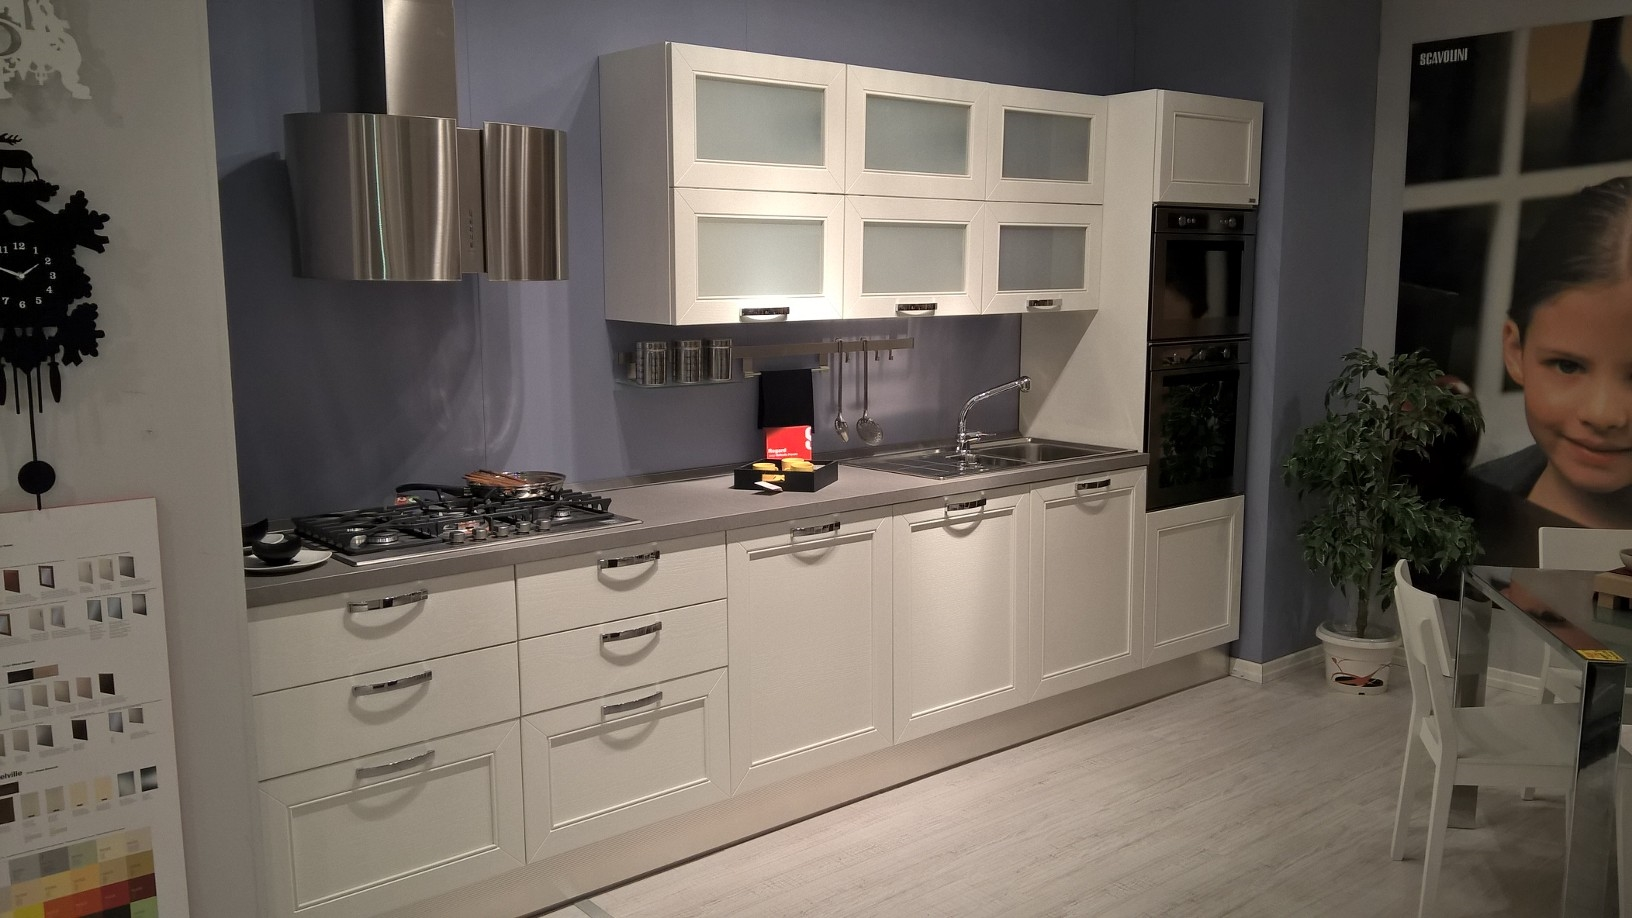 Cucine Scavolini Regard : Cucina scavolini regard moderne legno cucine a prezzi